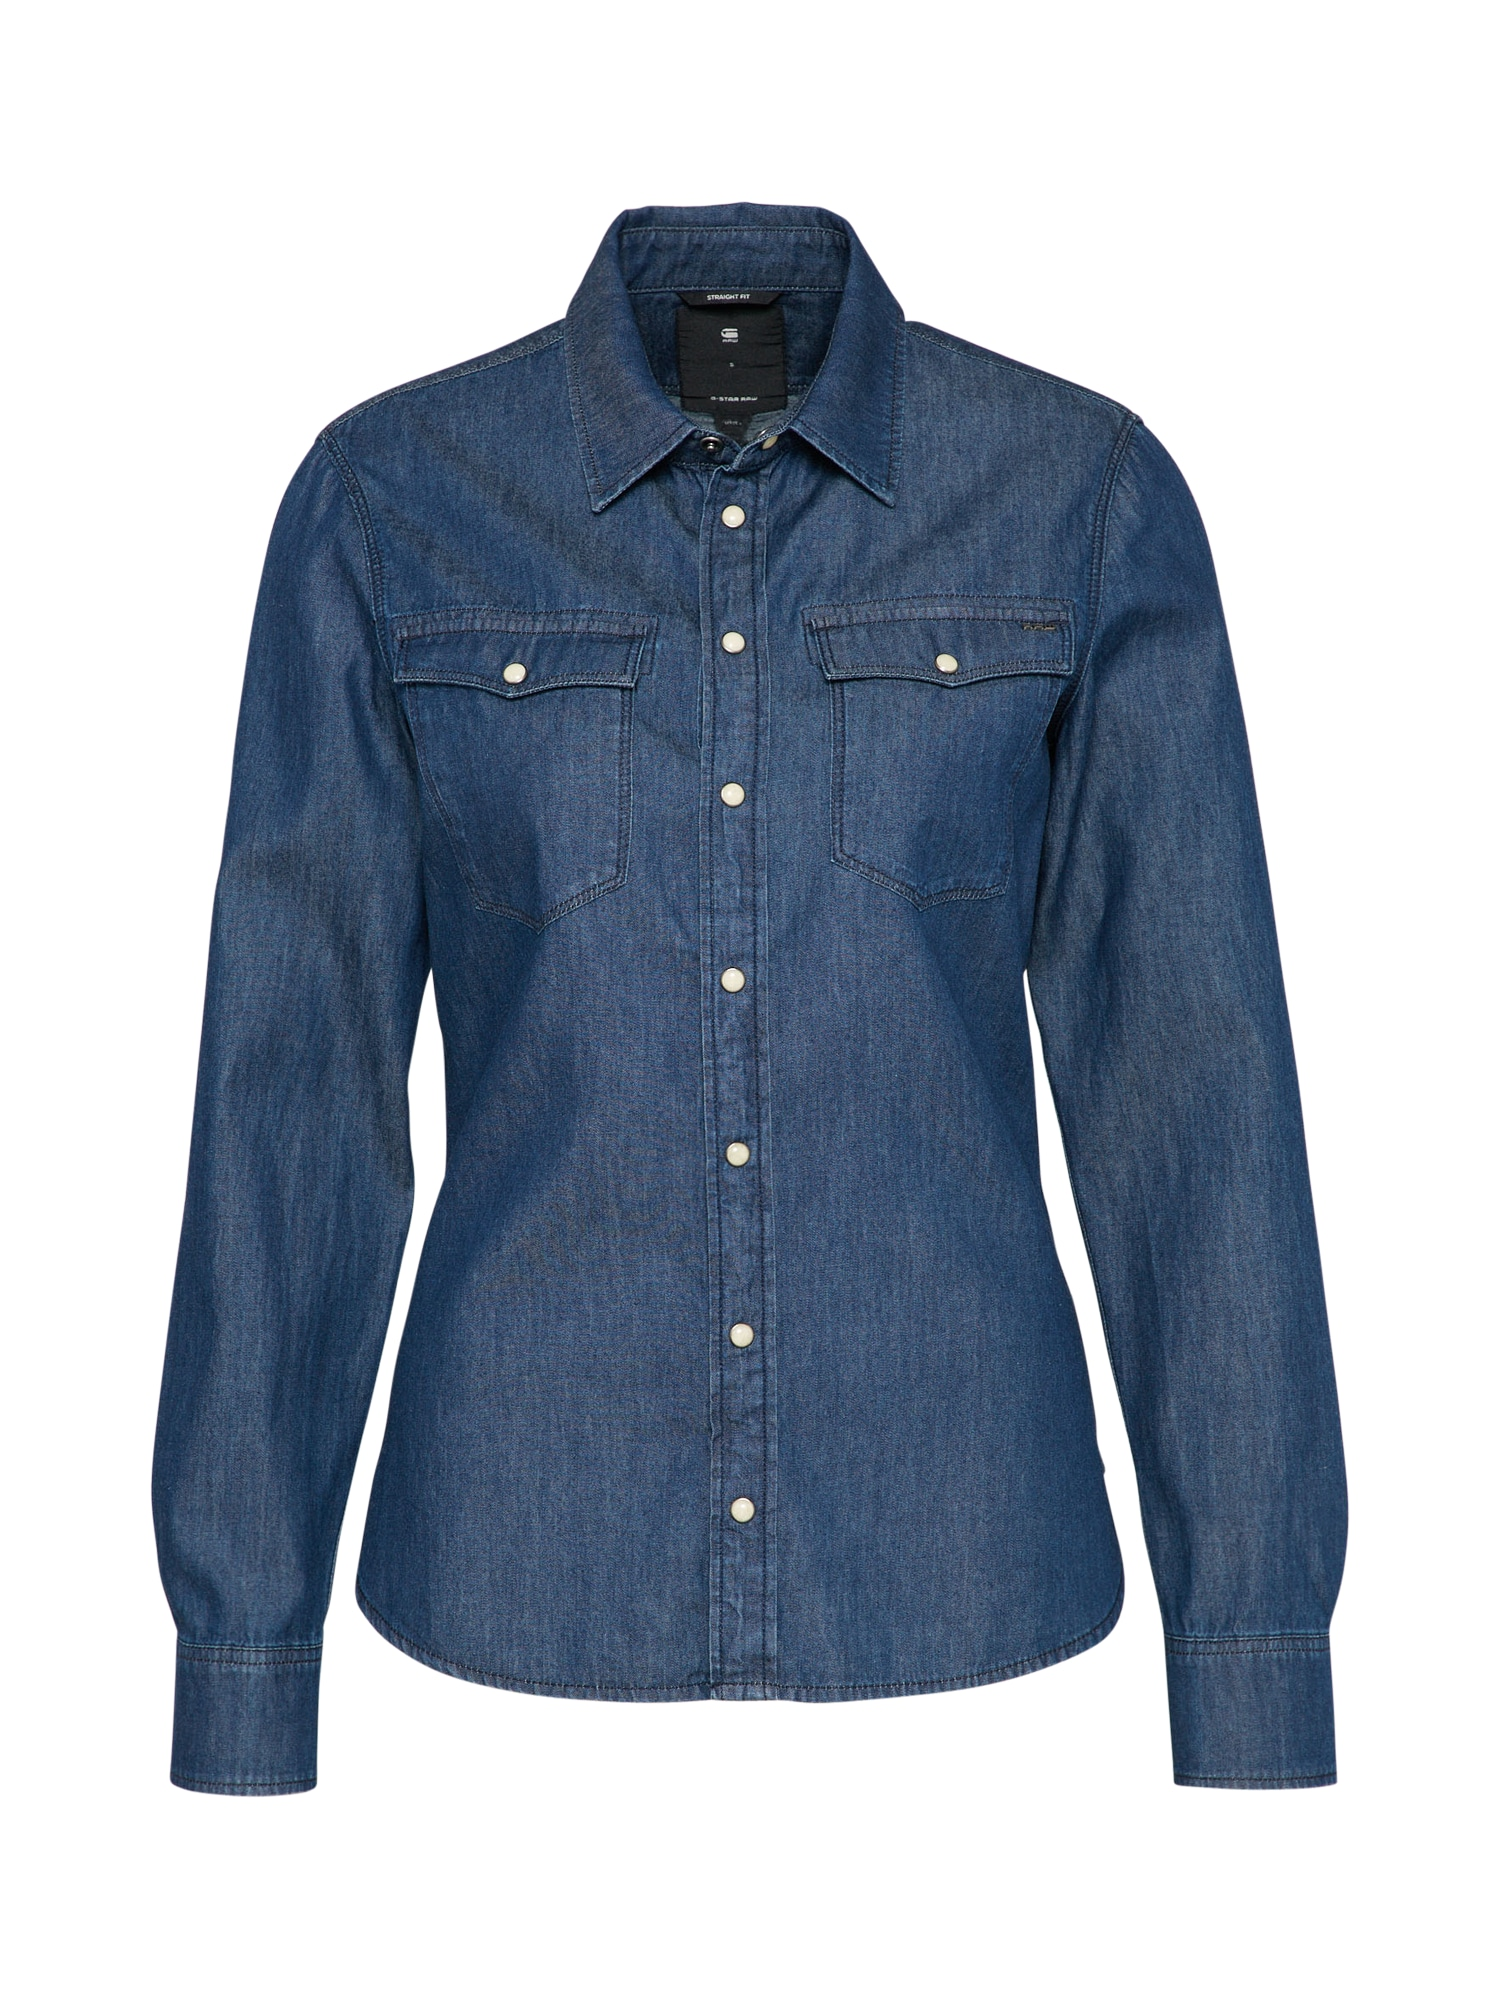 G-STAR RAW Dames Blouse 3301 blue denim